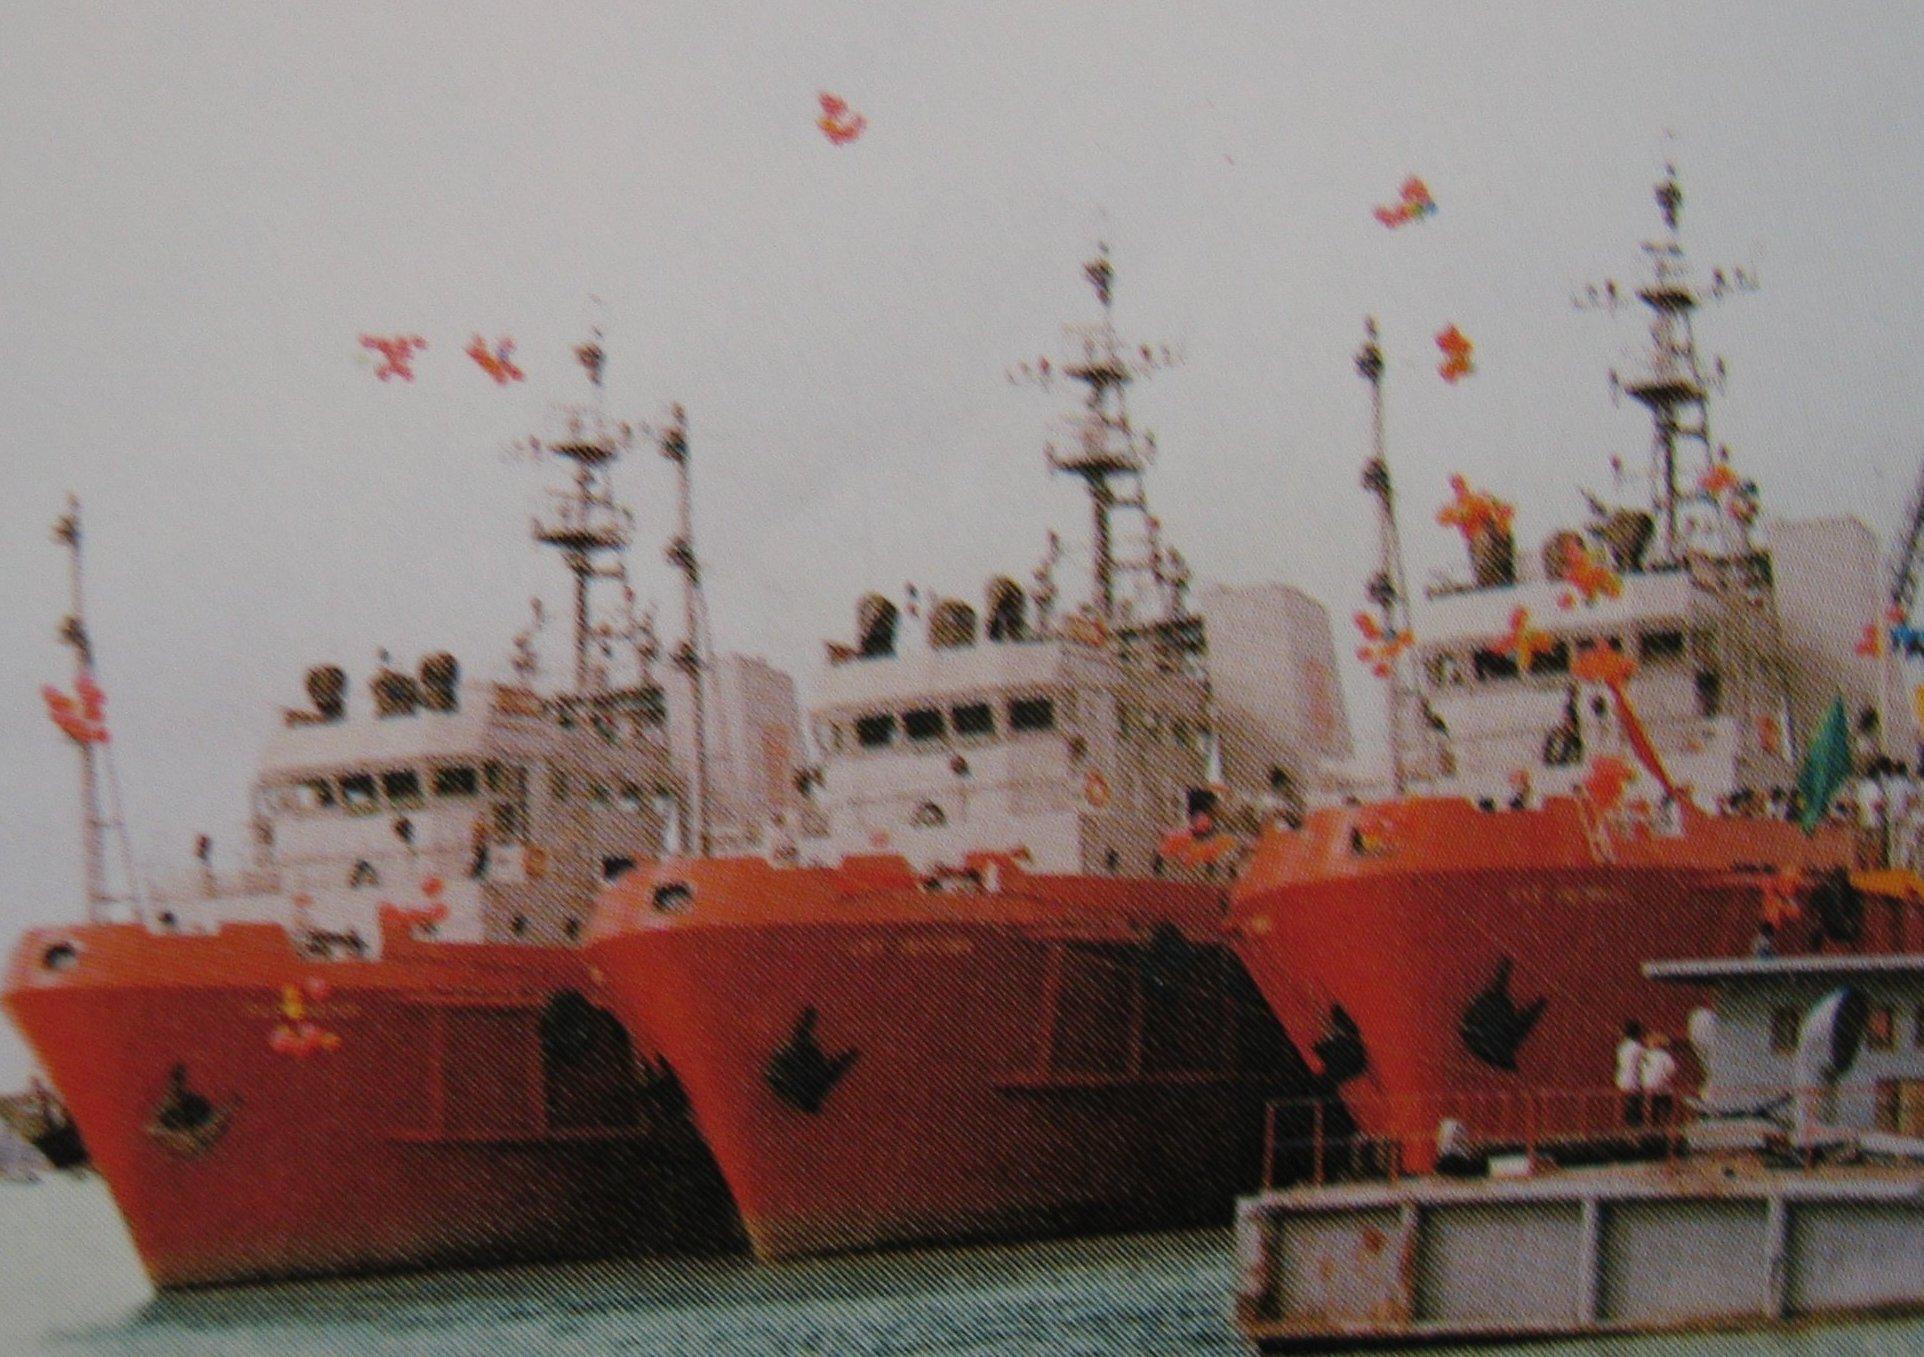 69070_Anchor_handling_tug_suply_vessel_122_438lo.JPG